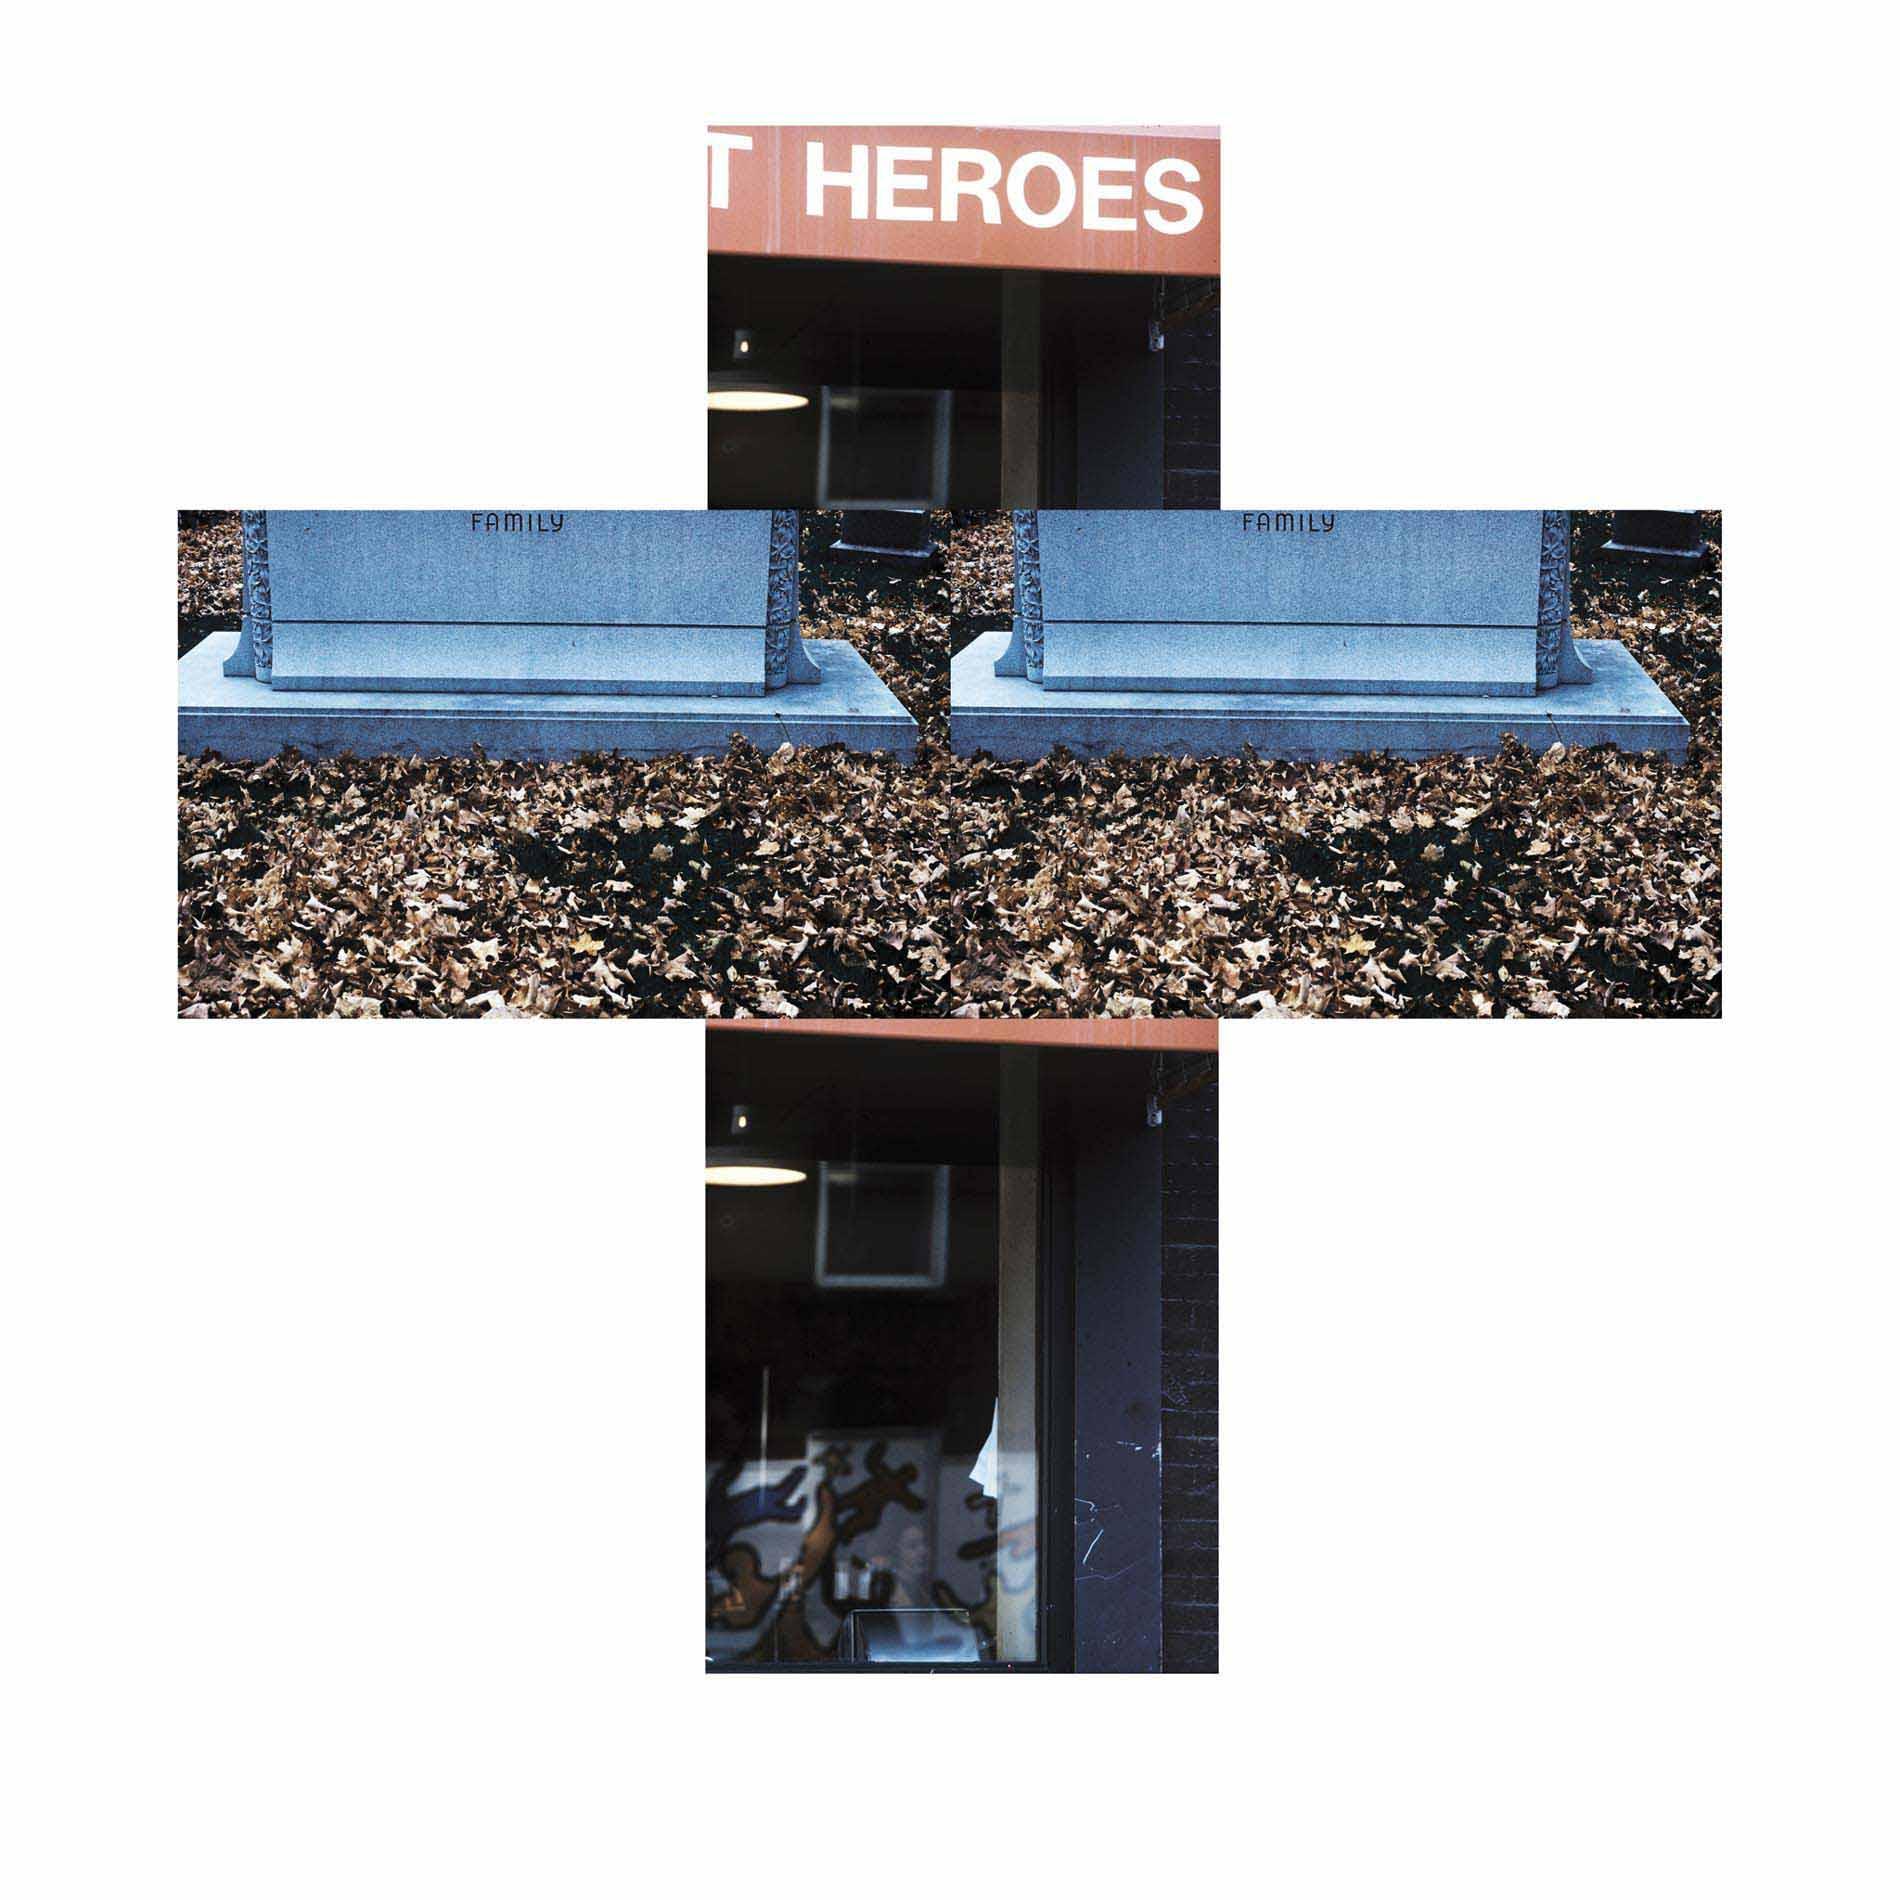 buena-memoria,-nando-mi-hermano,-family-heroes,1996